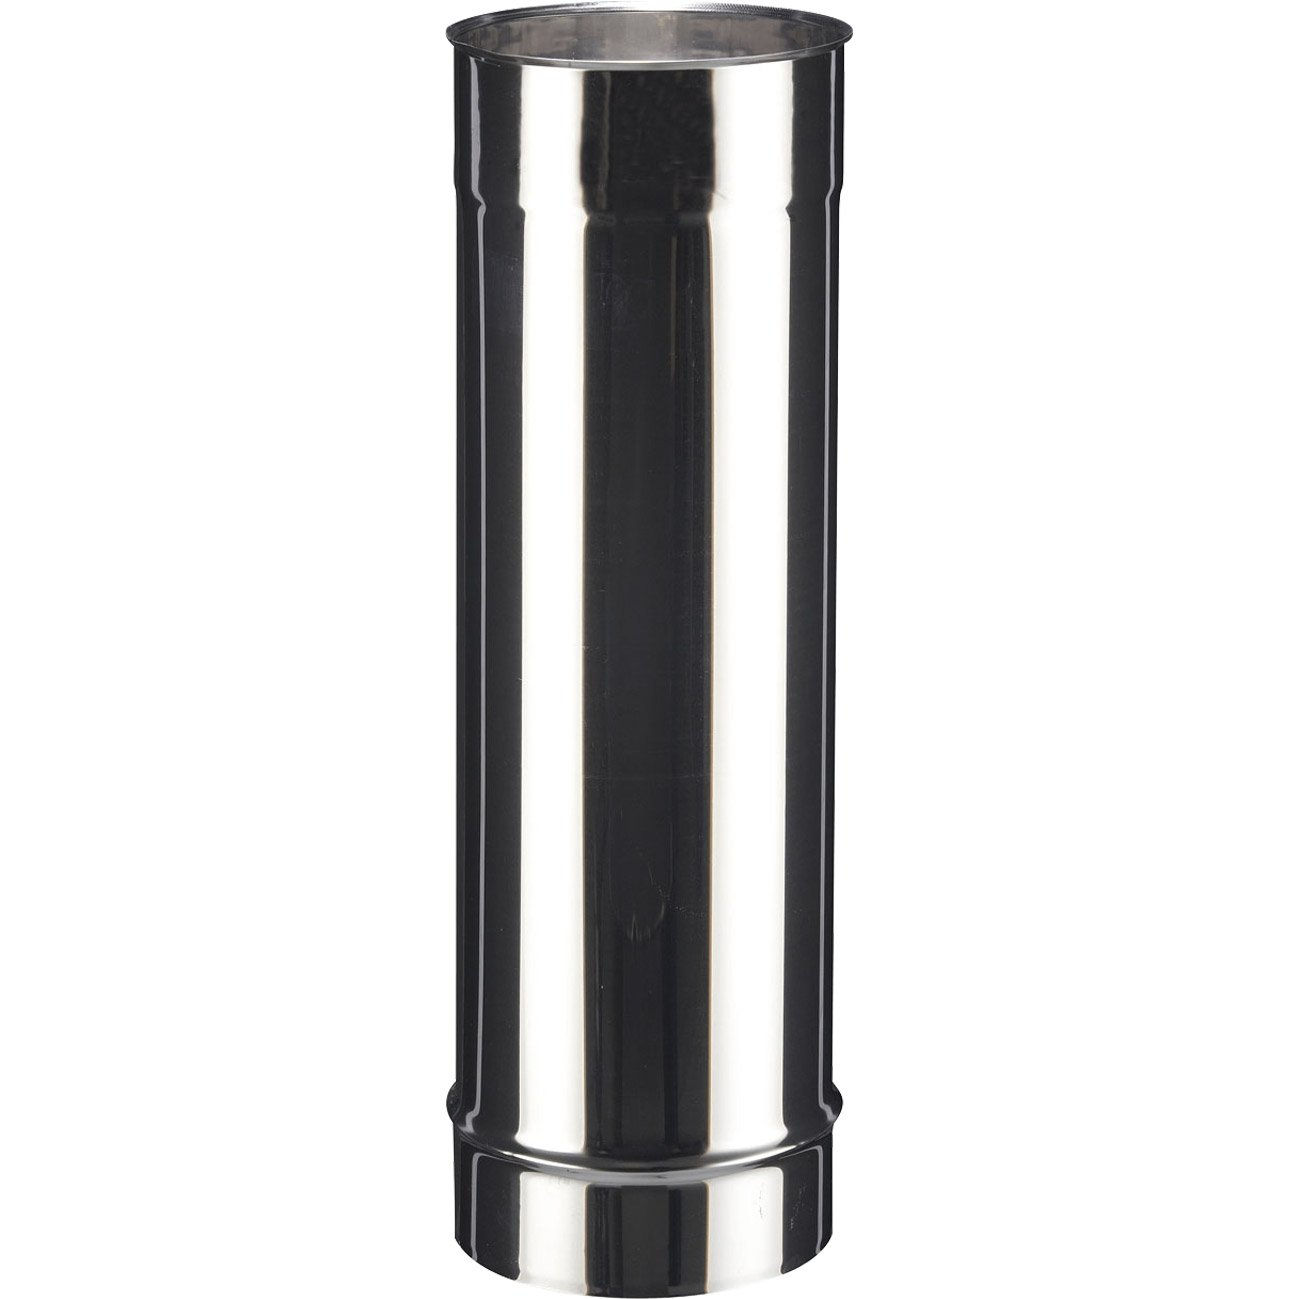 tuyau inox de raccordement poujoulat diam 150 mm 50 cm. Black Bedroom Furniture Sets. Home Design Ideas